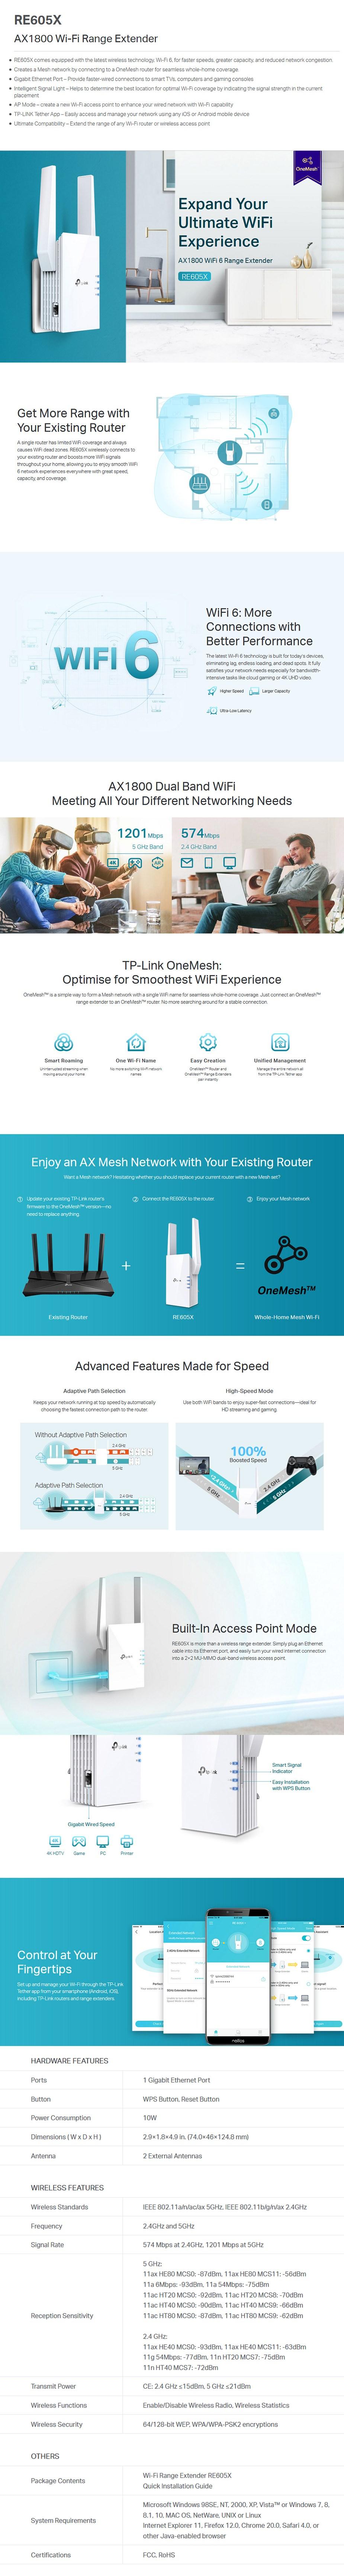 TP-Link RE605X AX1800 Wi-Fi Range Extender - Desktop Overview 1